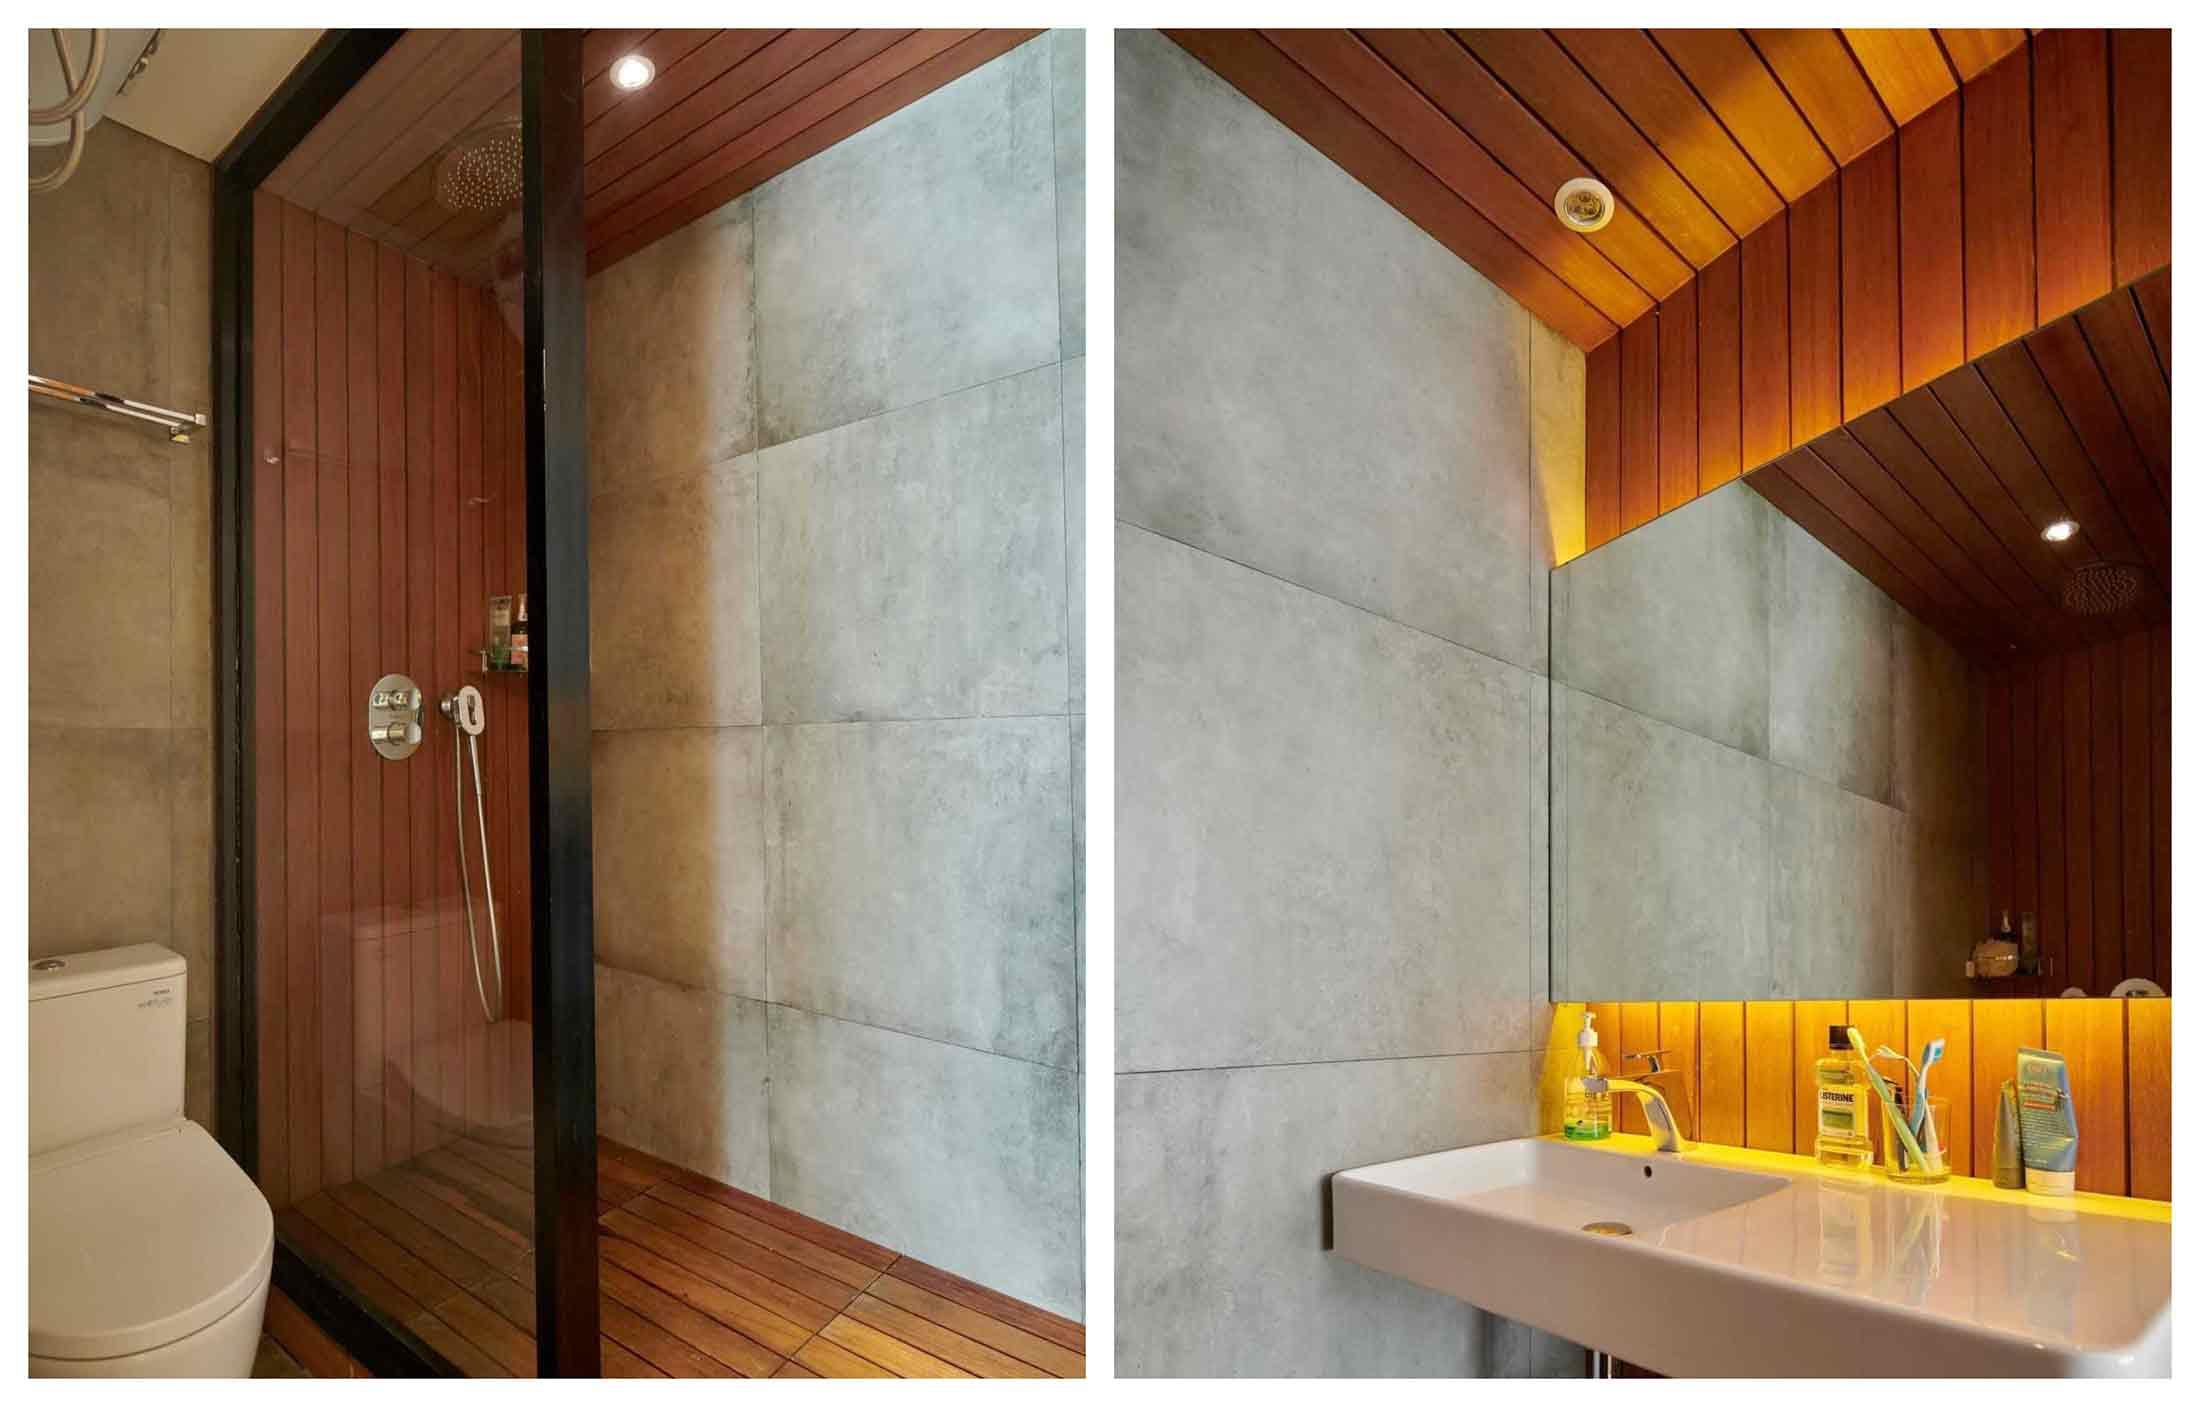 Perpaduan beton ekspos dan kayu untuk kamar mandi, karya Hadivincent Architects, via arsitag.com